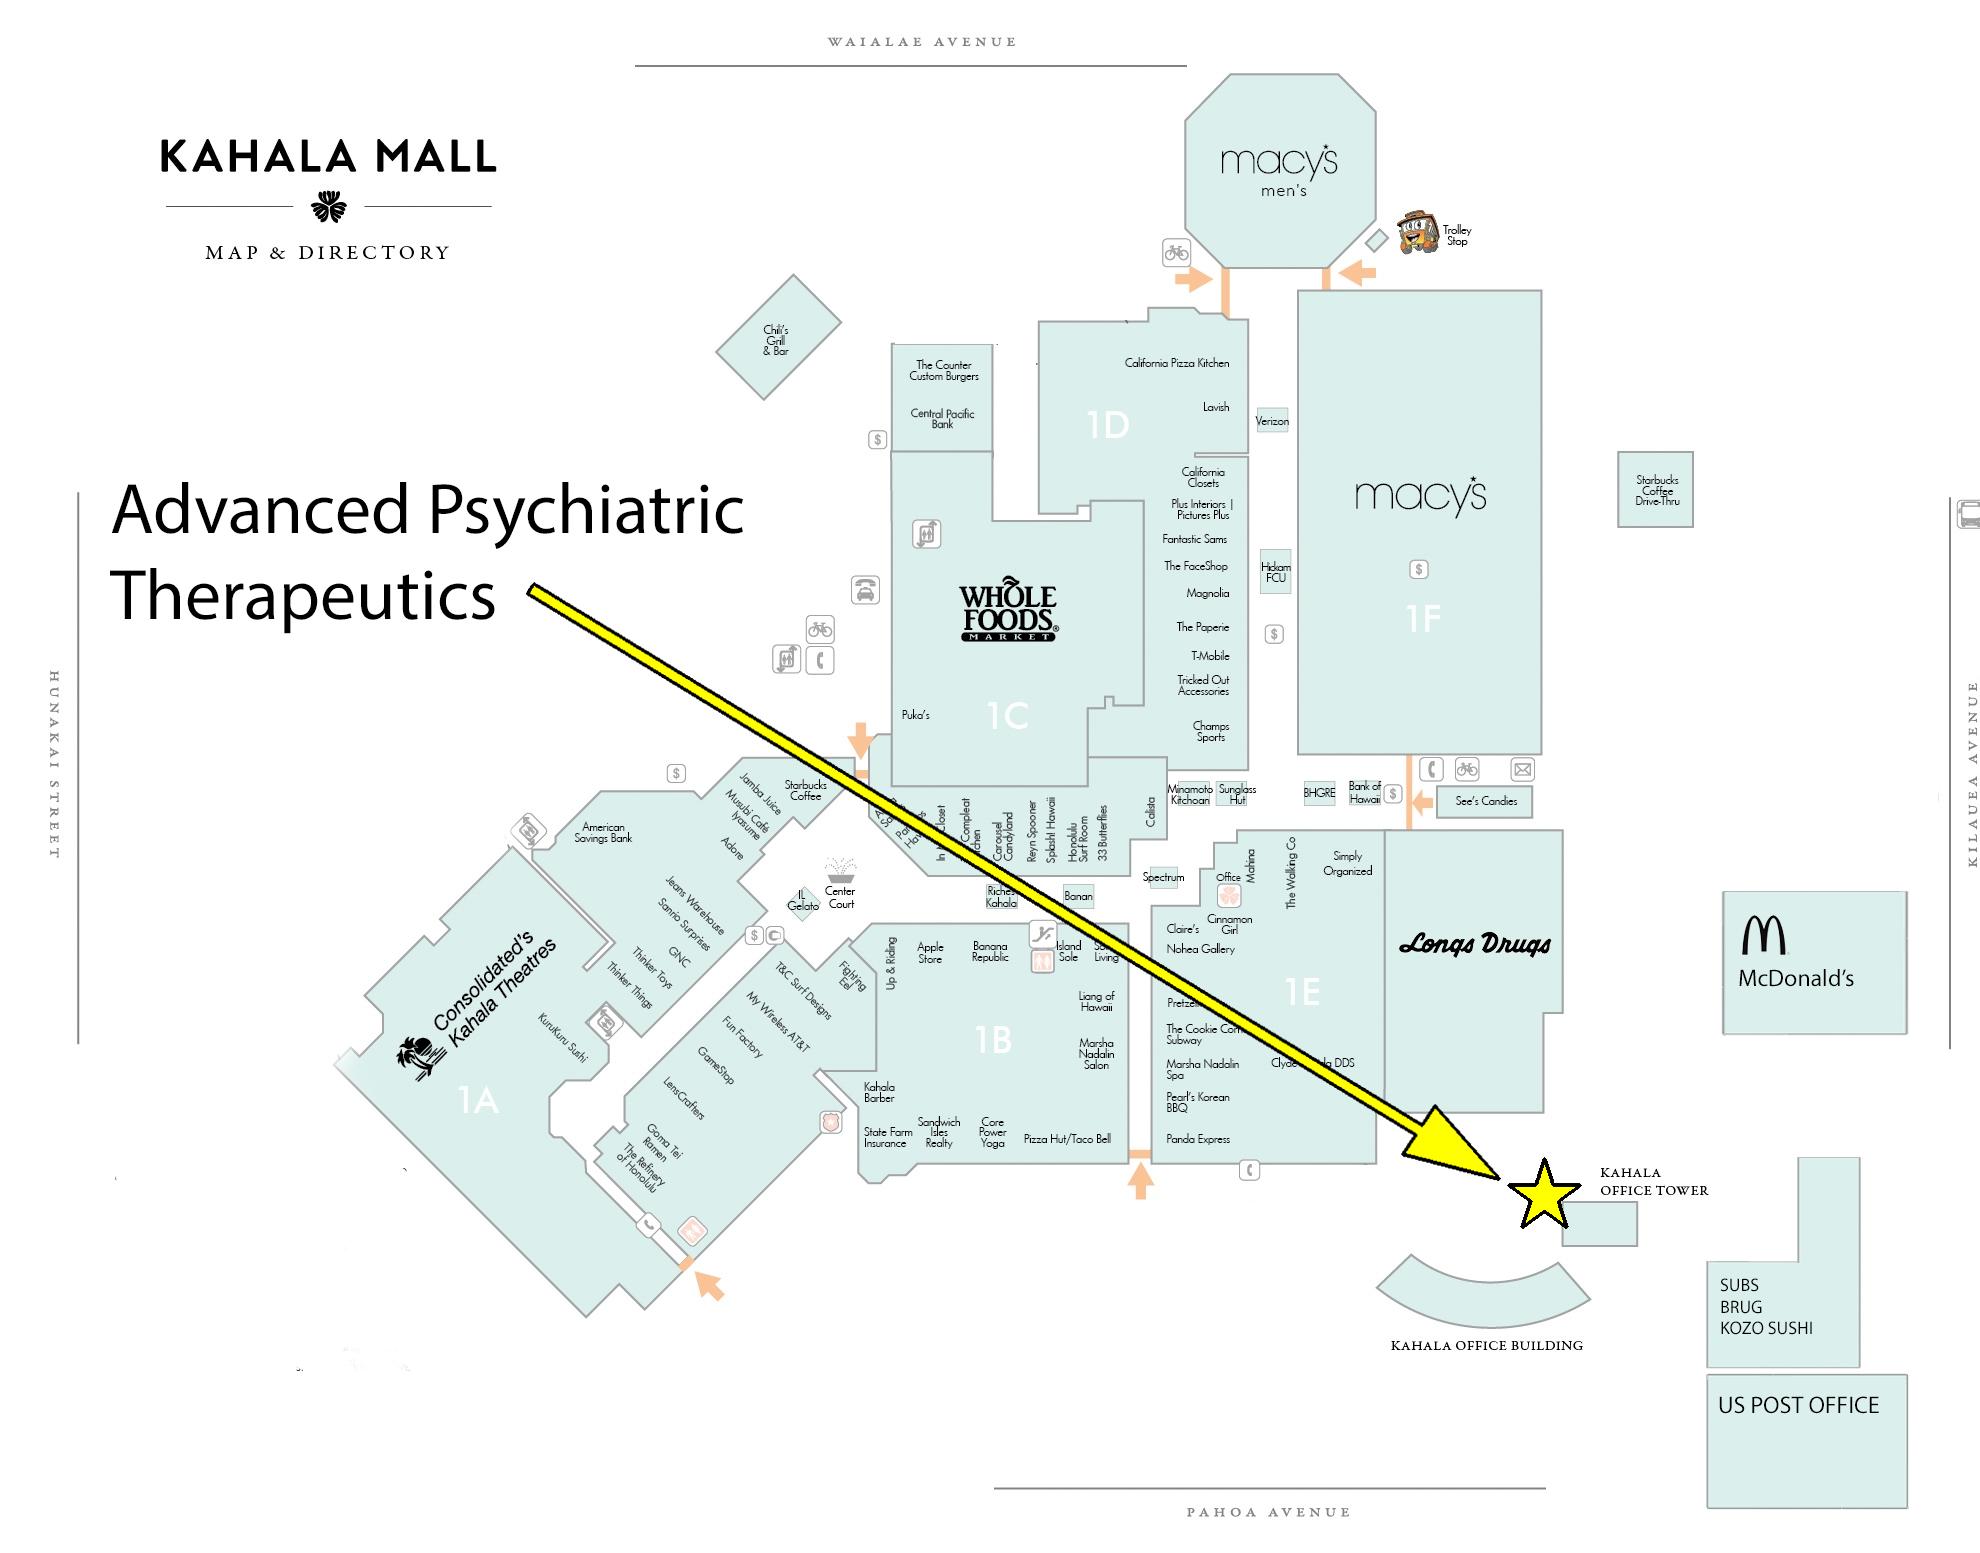 Map of Kahala Mall area showing APT